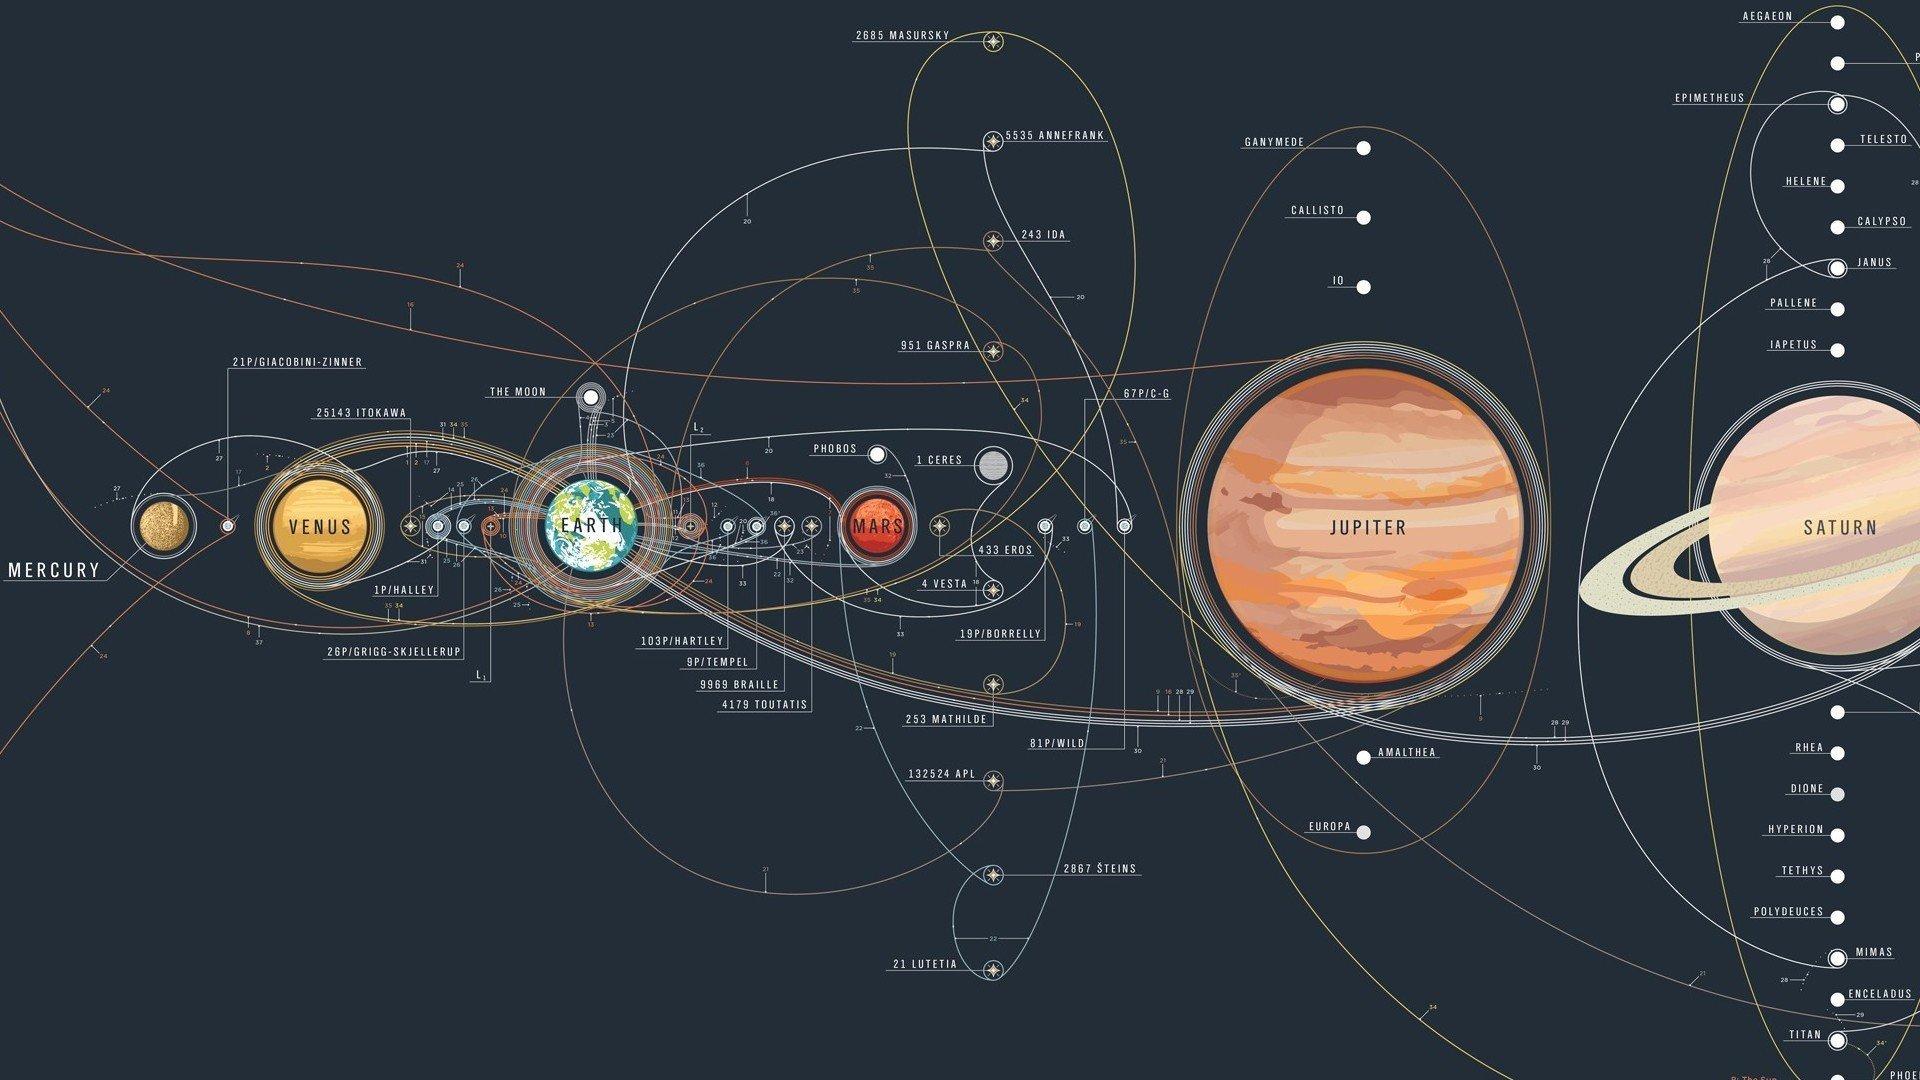 Space Solar System Mercury Venus Earth Satellite Moon